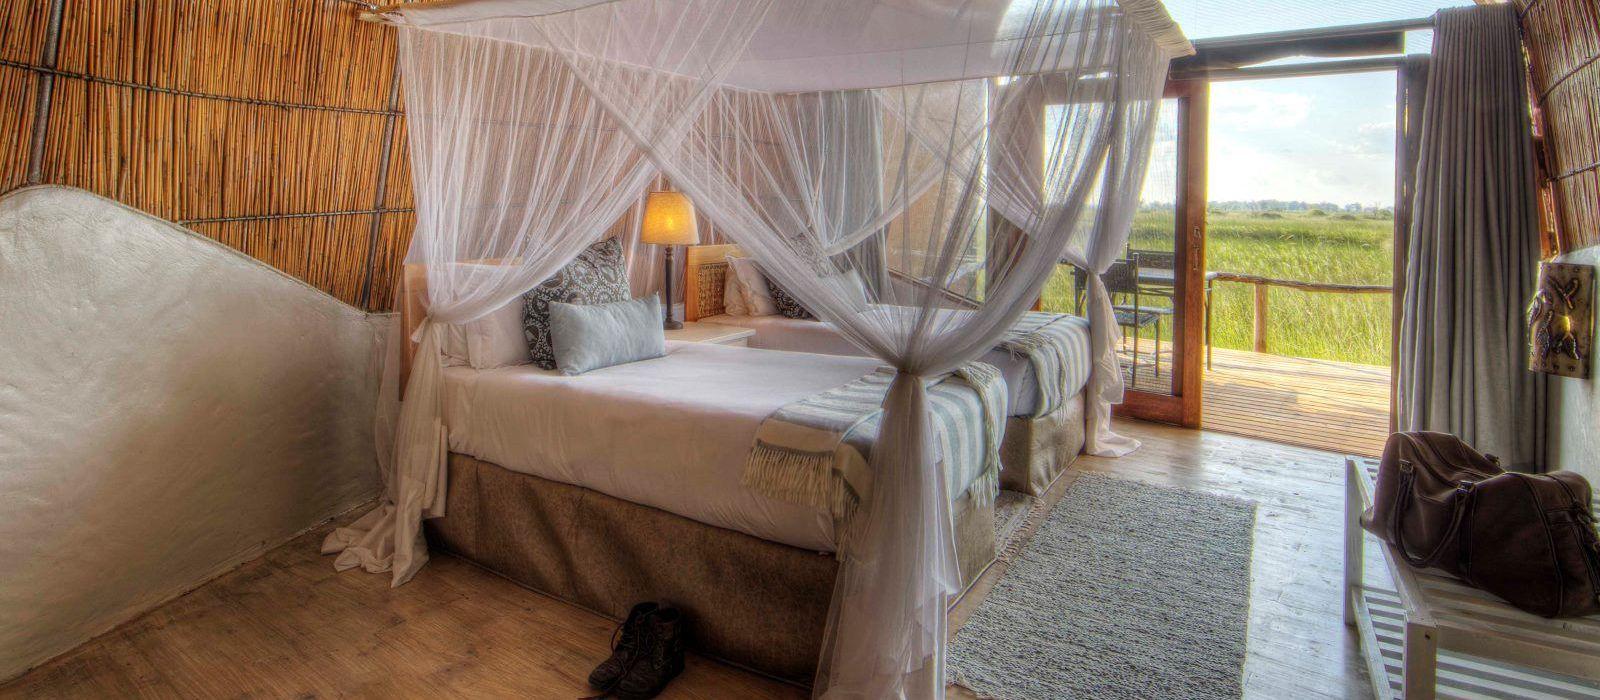 Hotel Camp Okuti Botswana